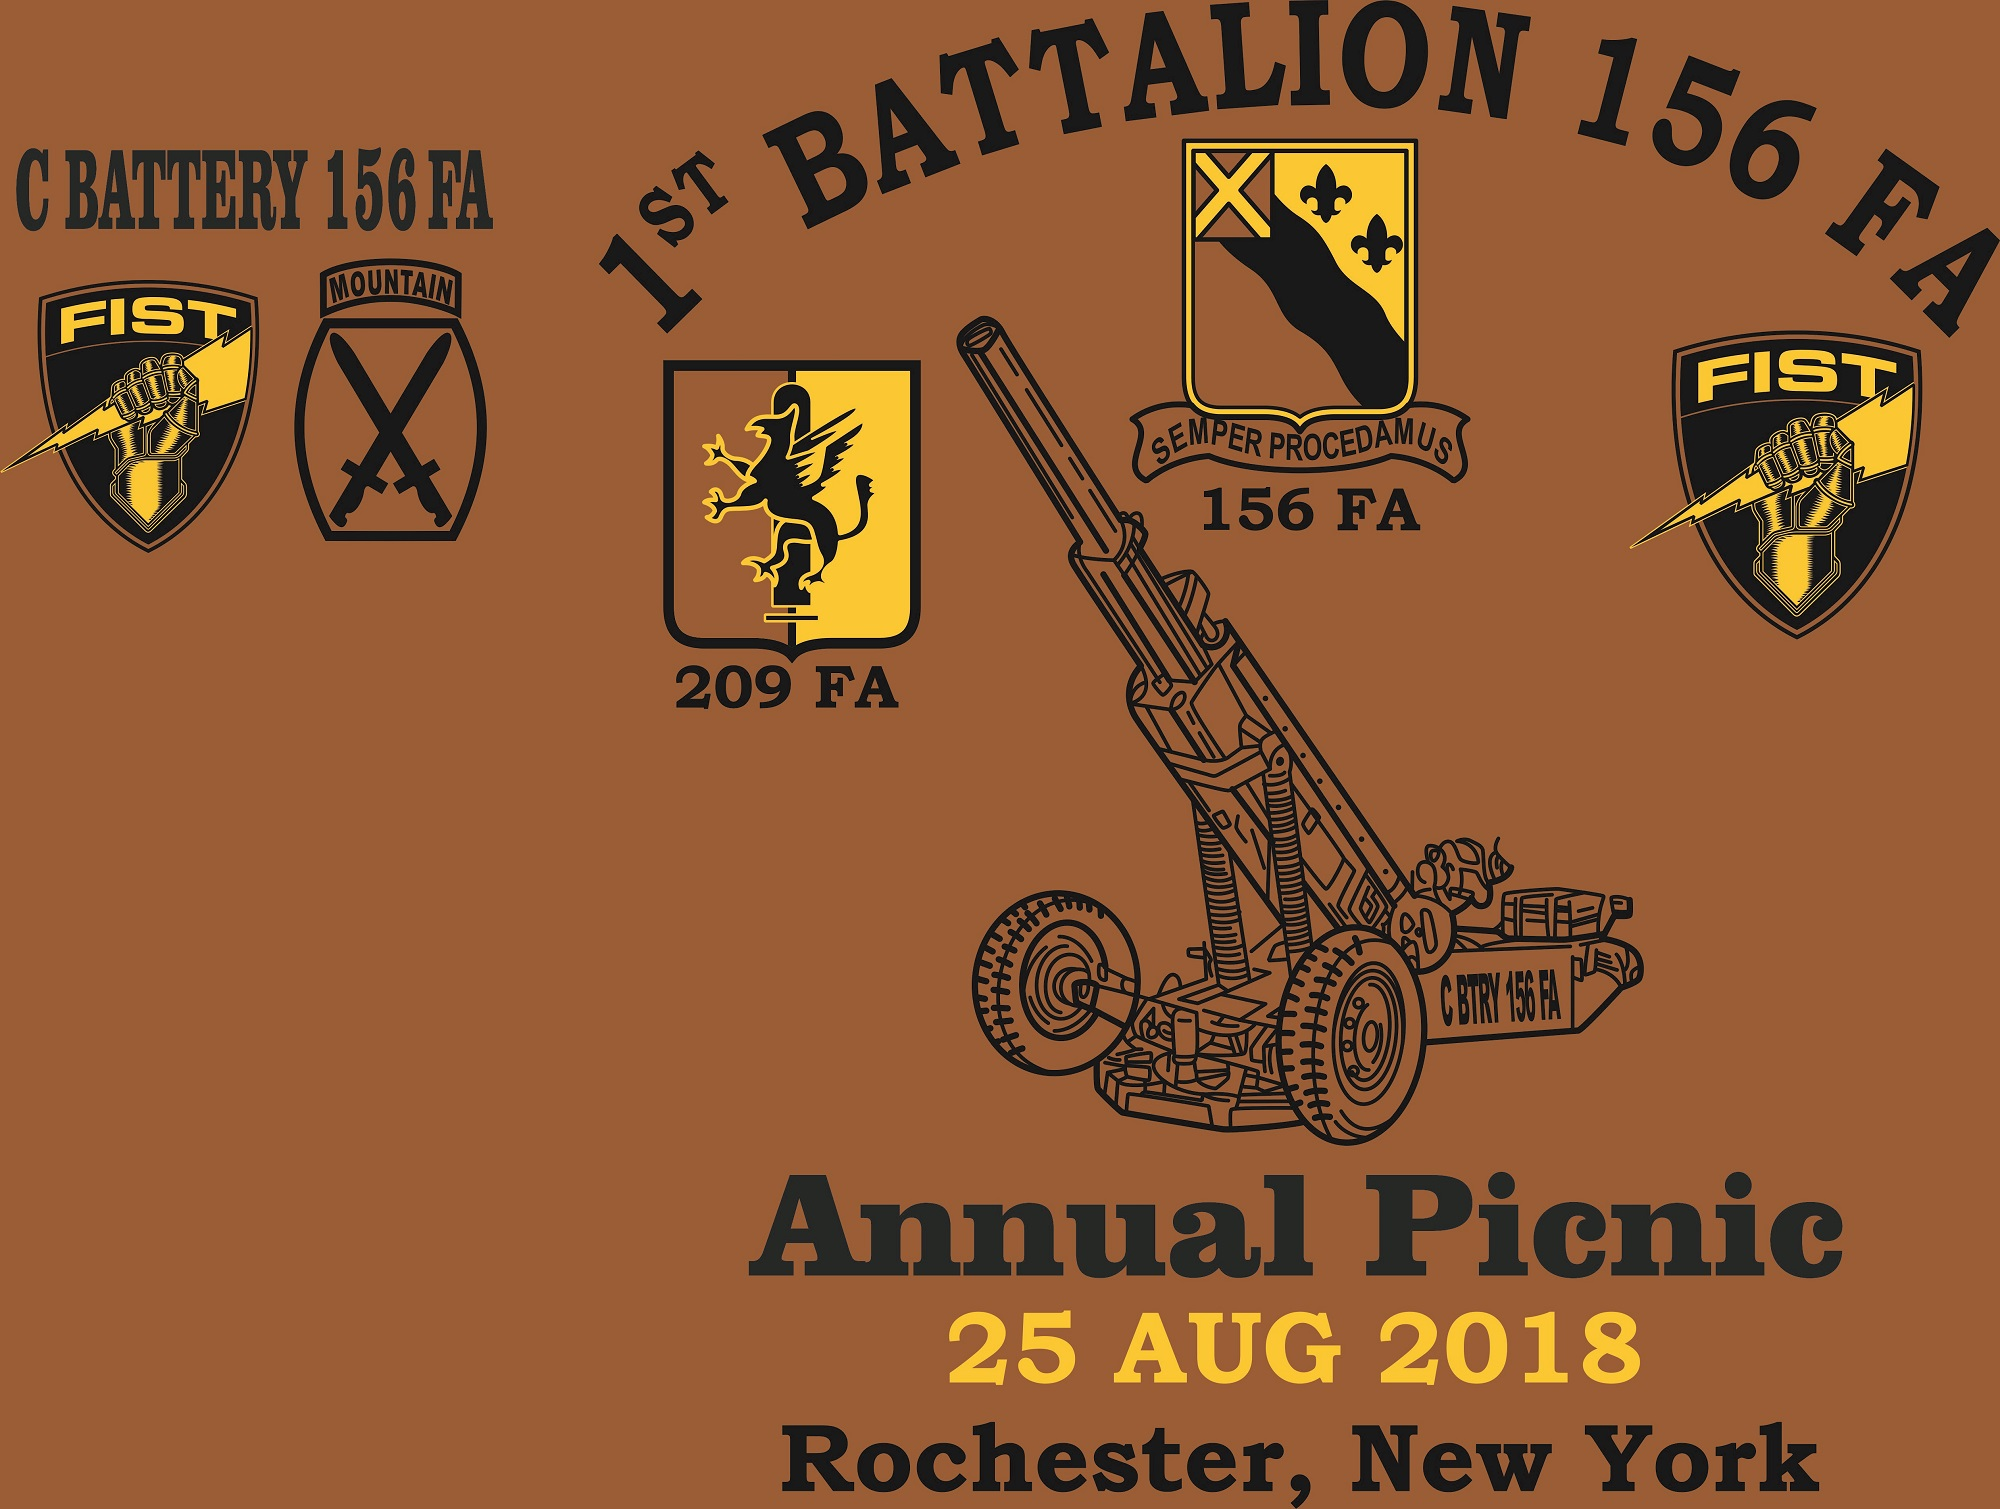 C BTRY 156 FA ANNUAL PICNIC 2018 (002) logo and screen print